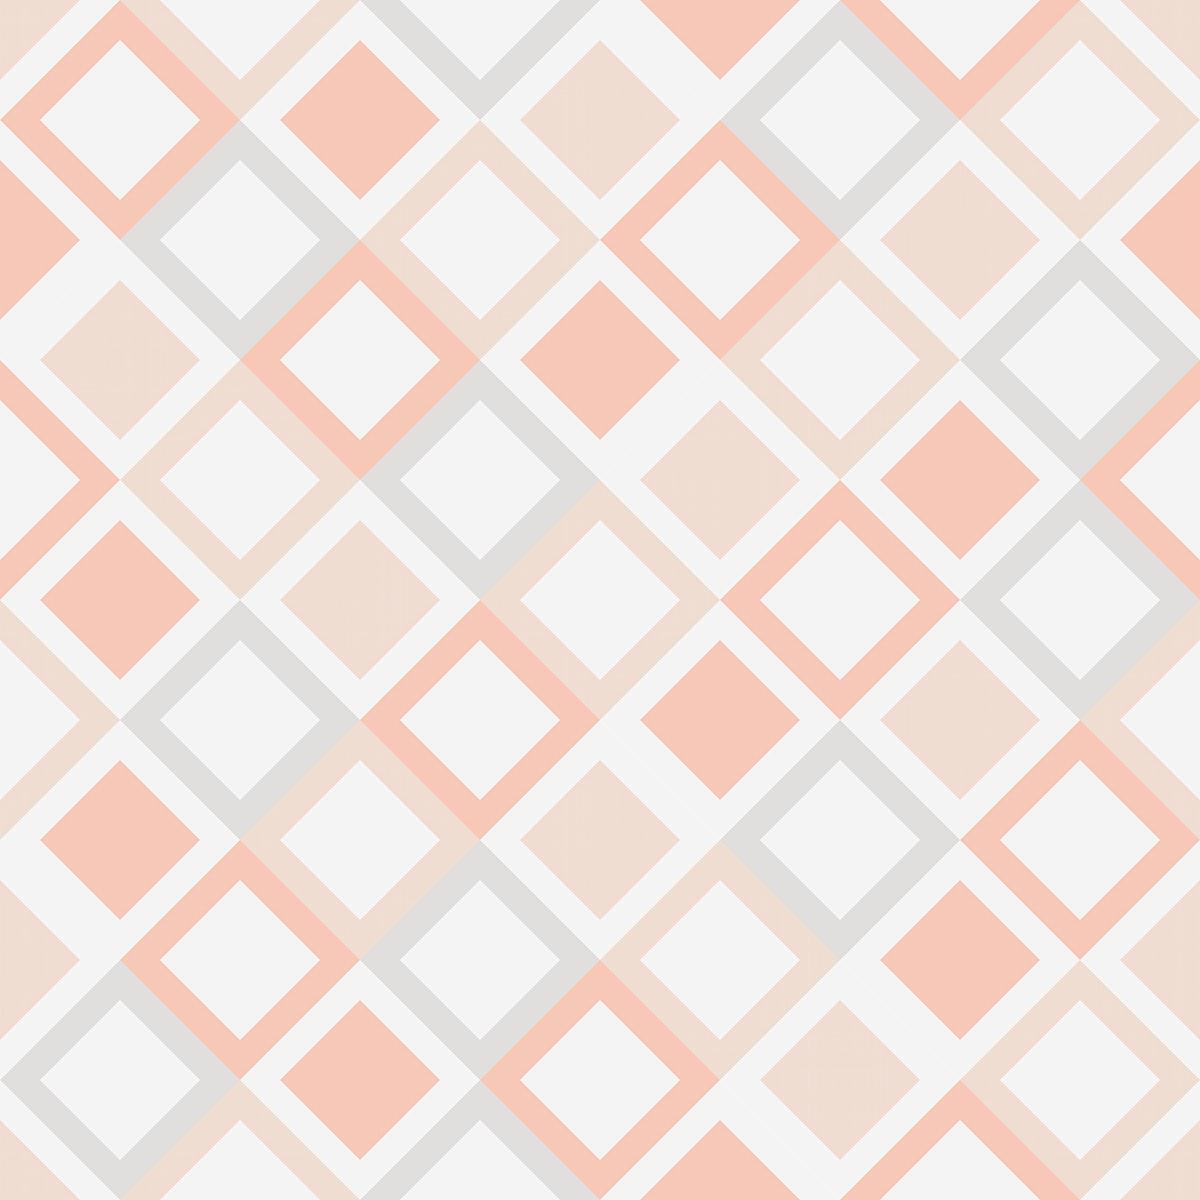 Geometrical squared pattern vector illustration